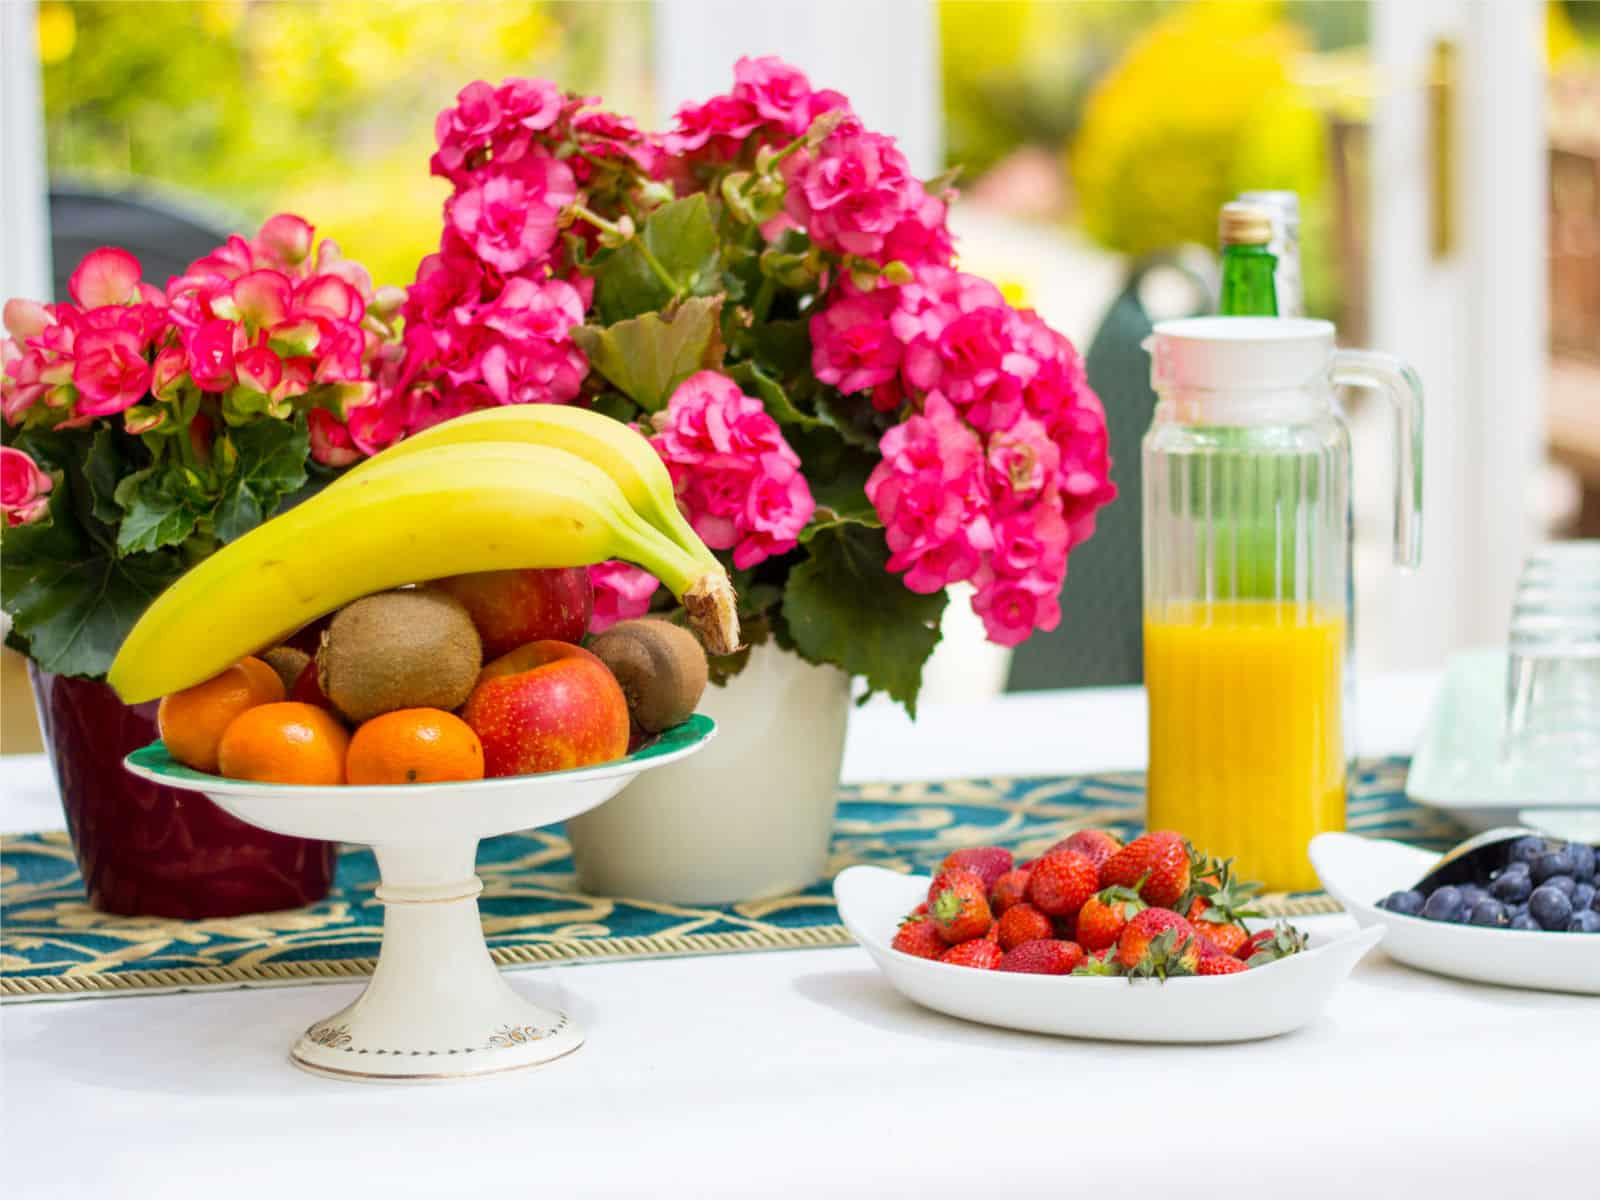 Breakfast Table Polraen Country House